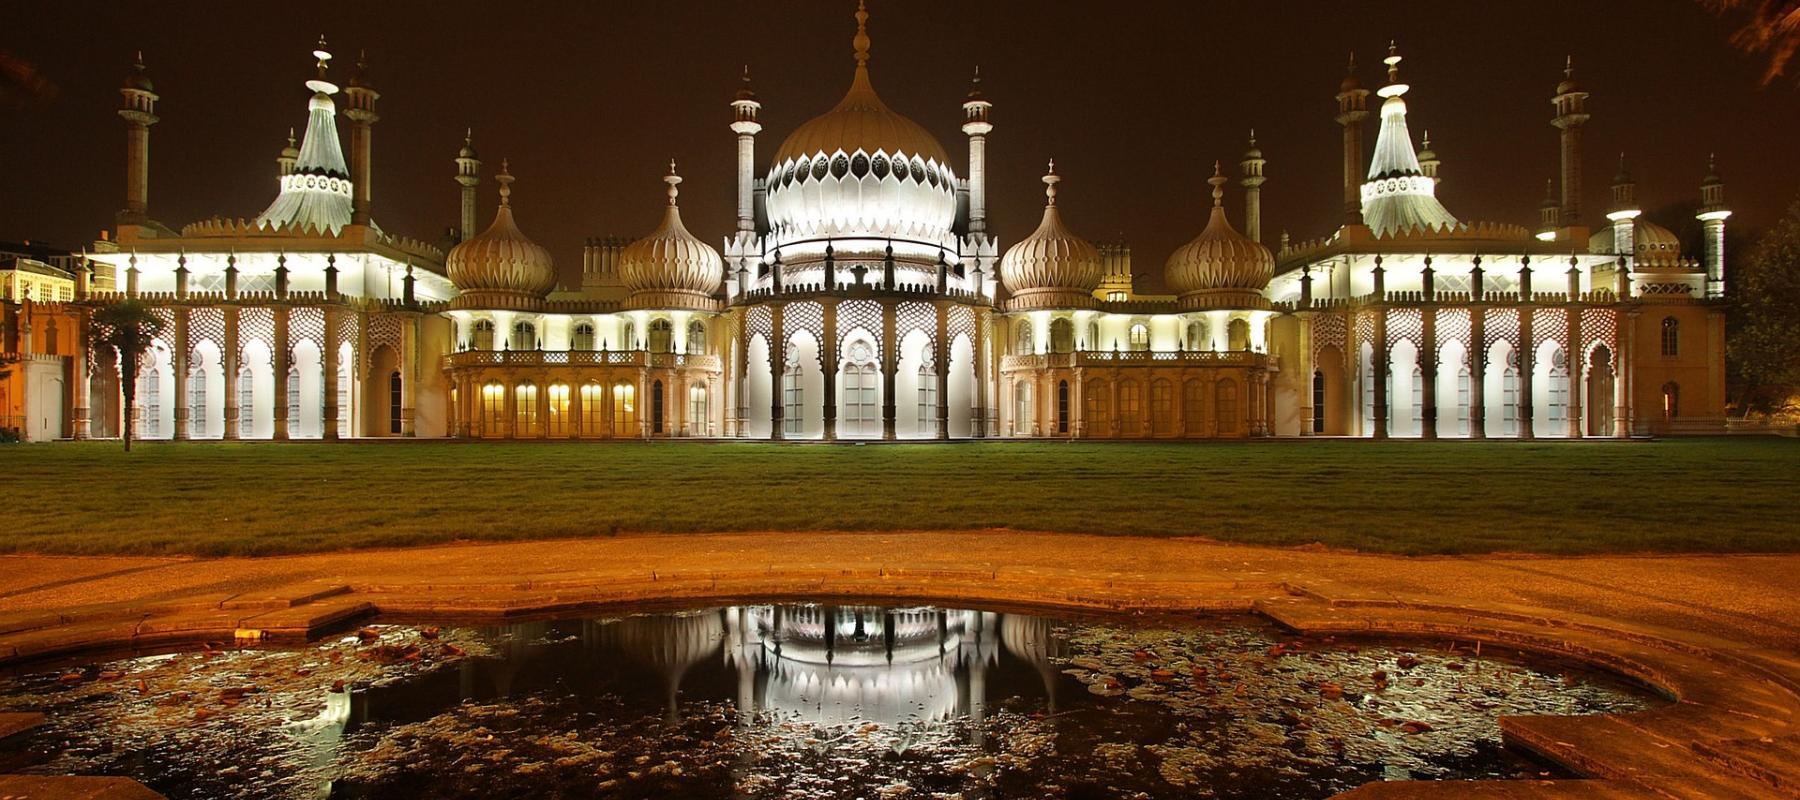 Royal Pavilion Brighton lit up at night. Photo: Roman Grac from Pixabay